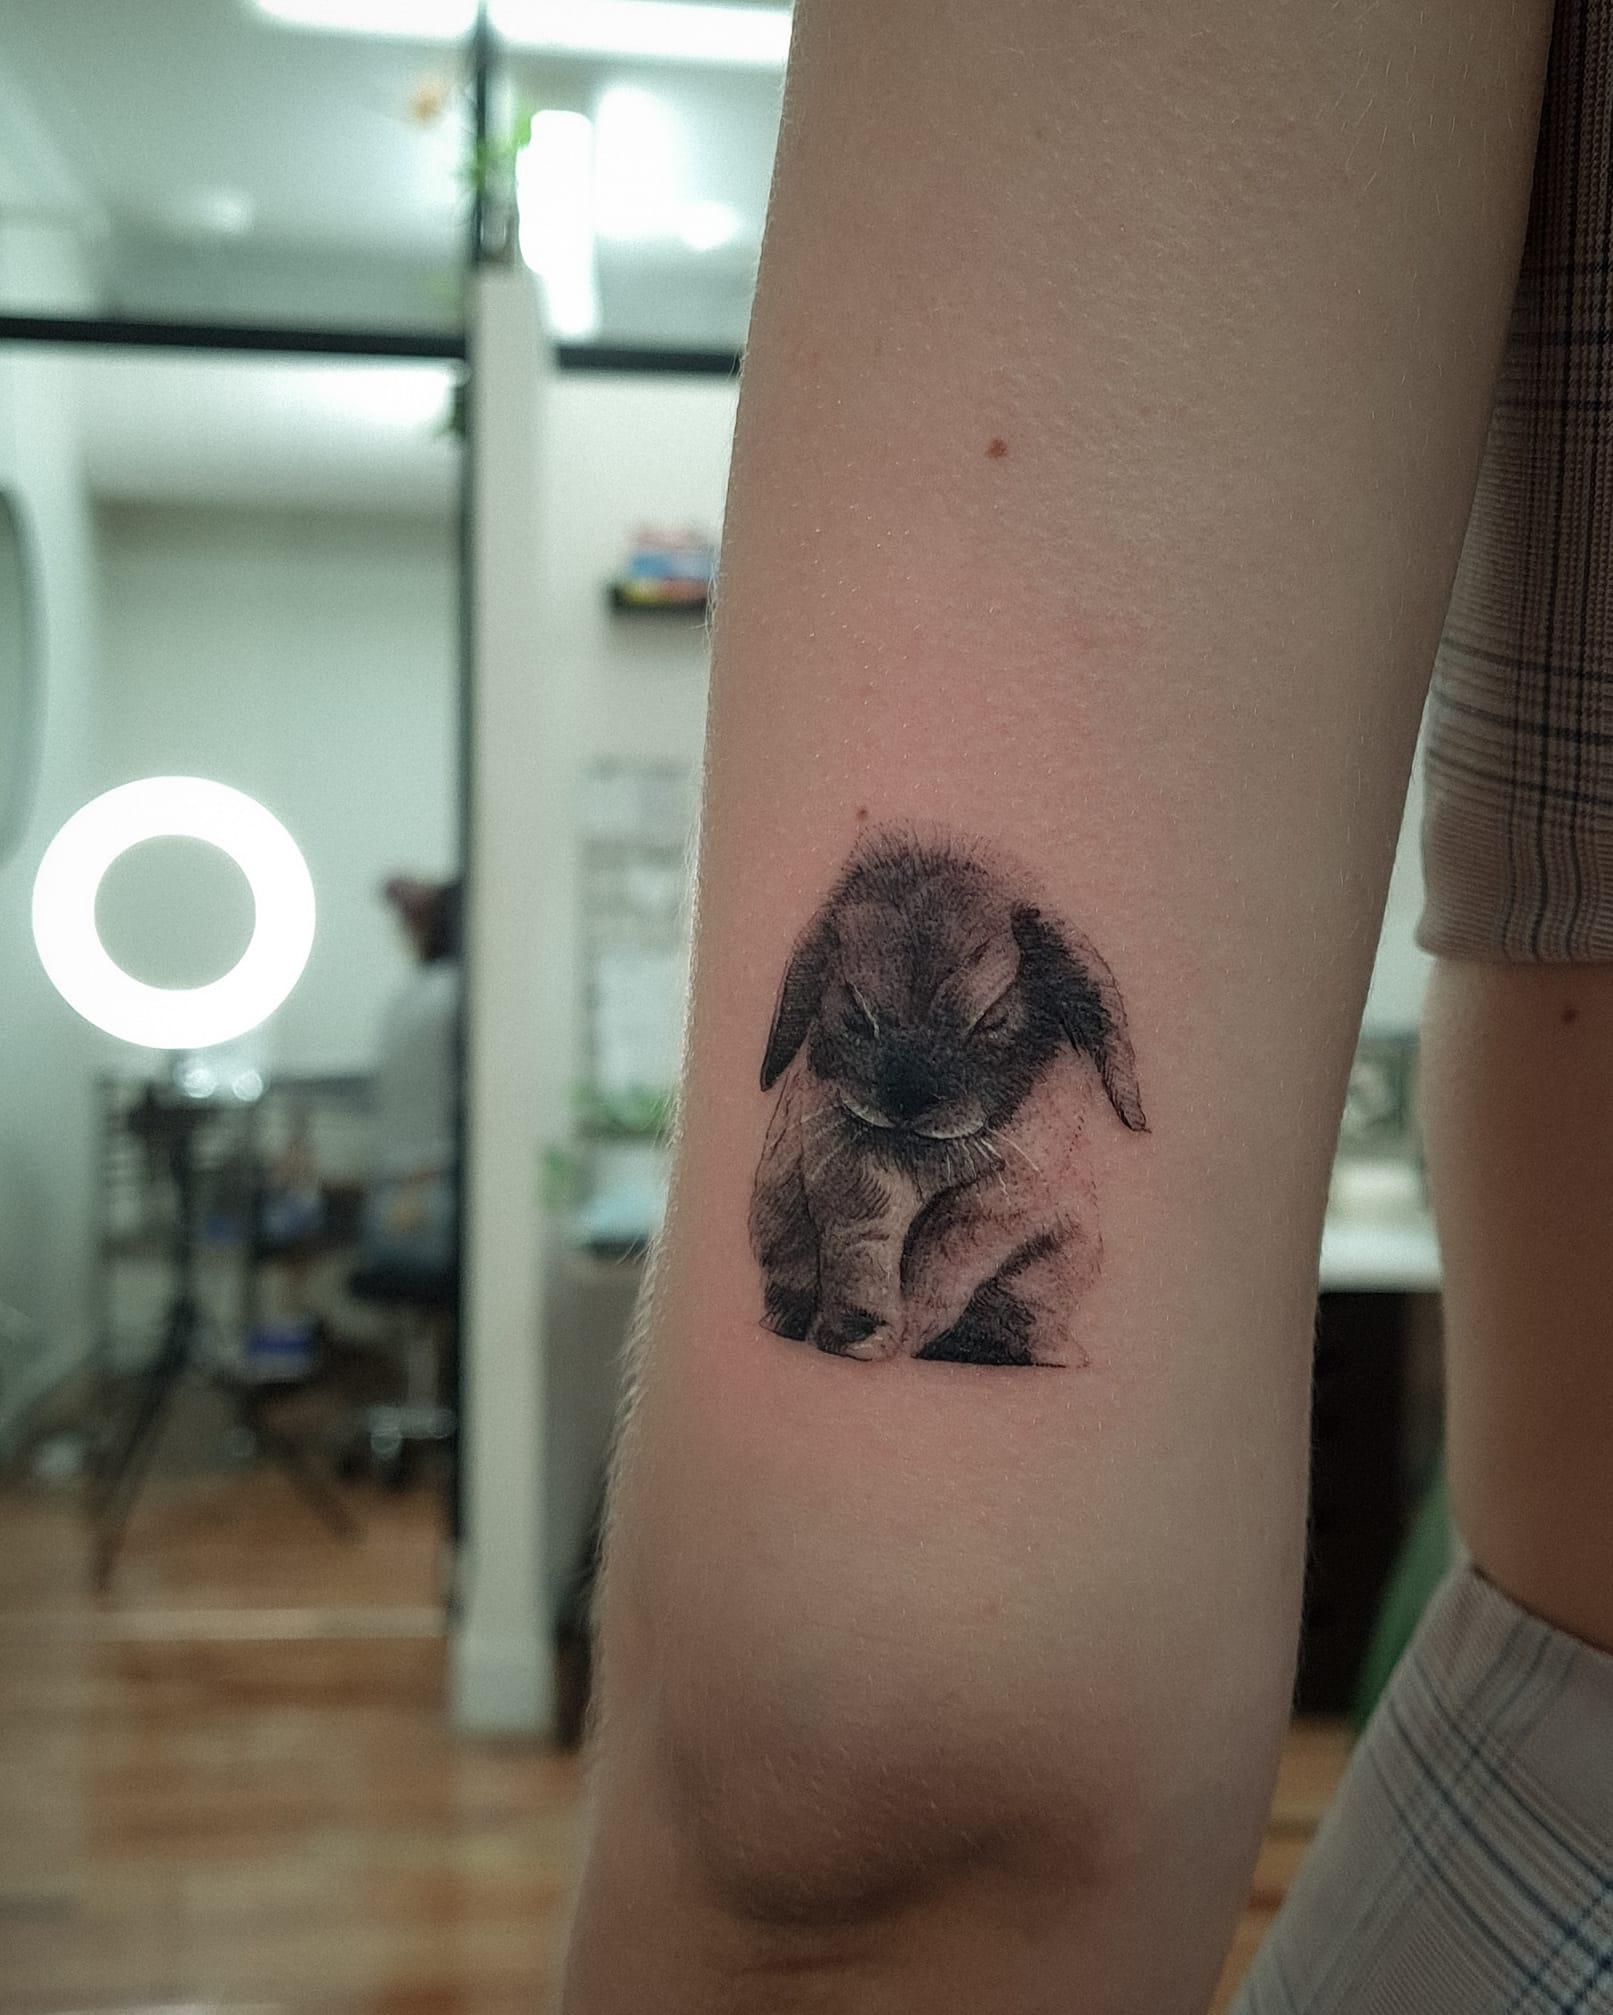 Tattoo Artists in Brisbane